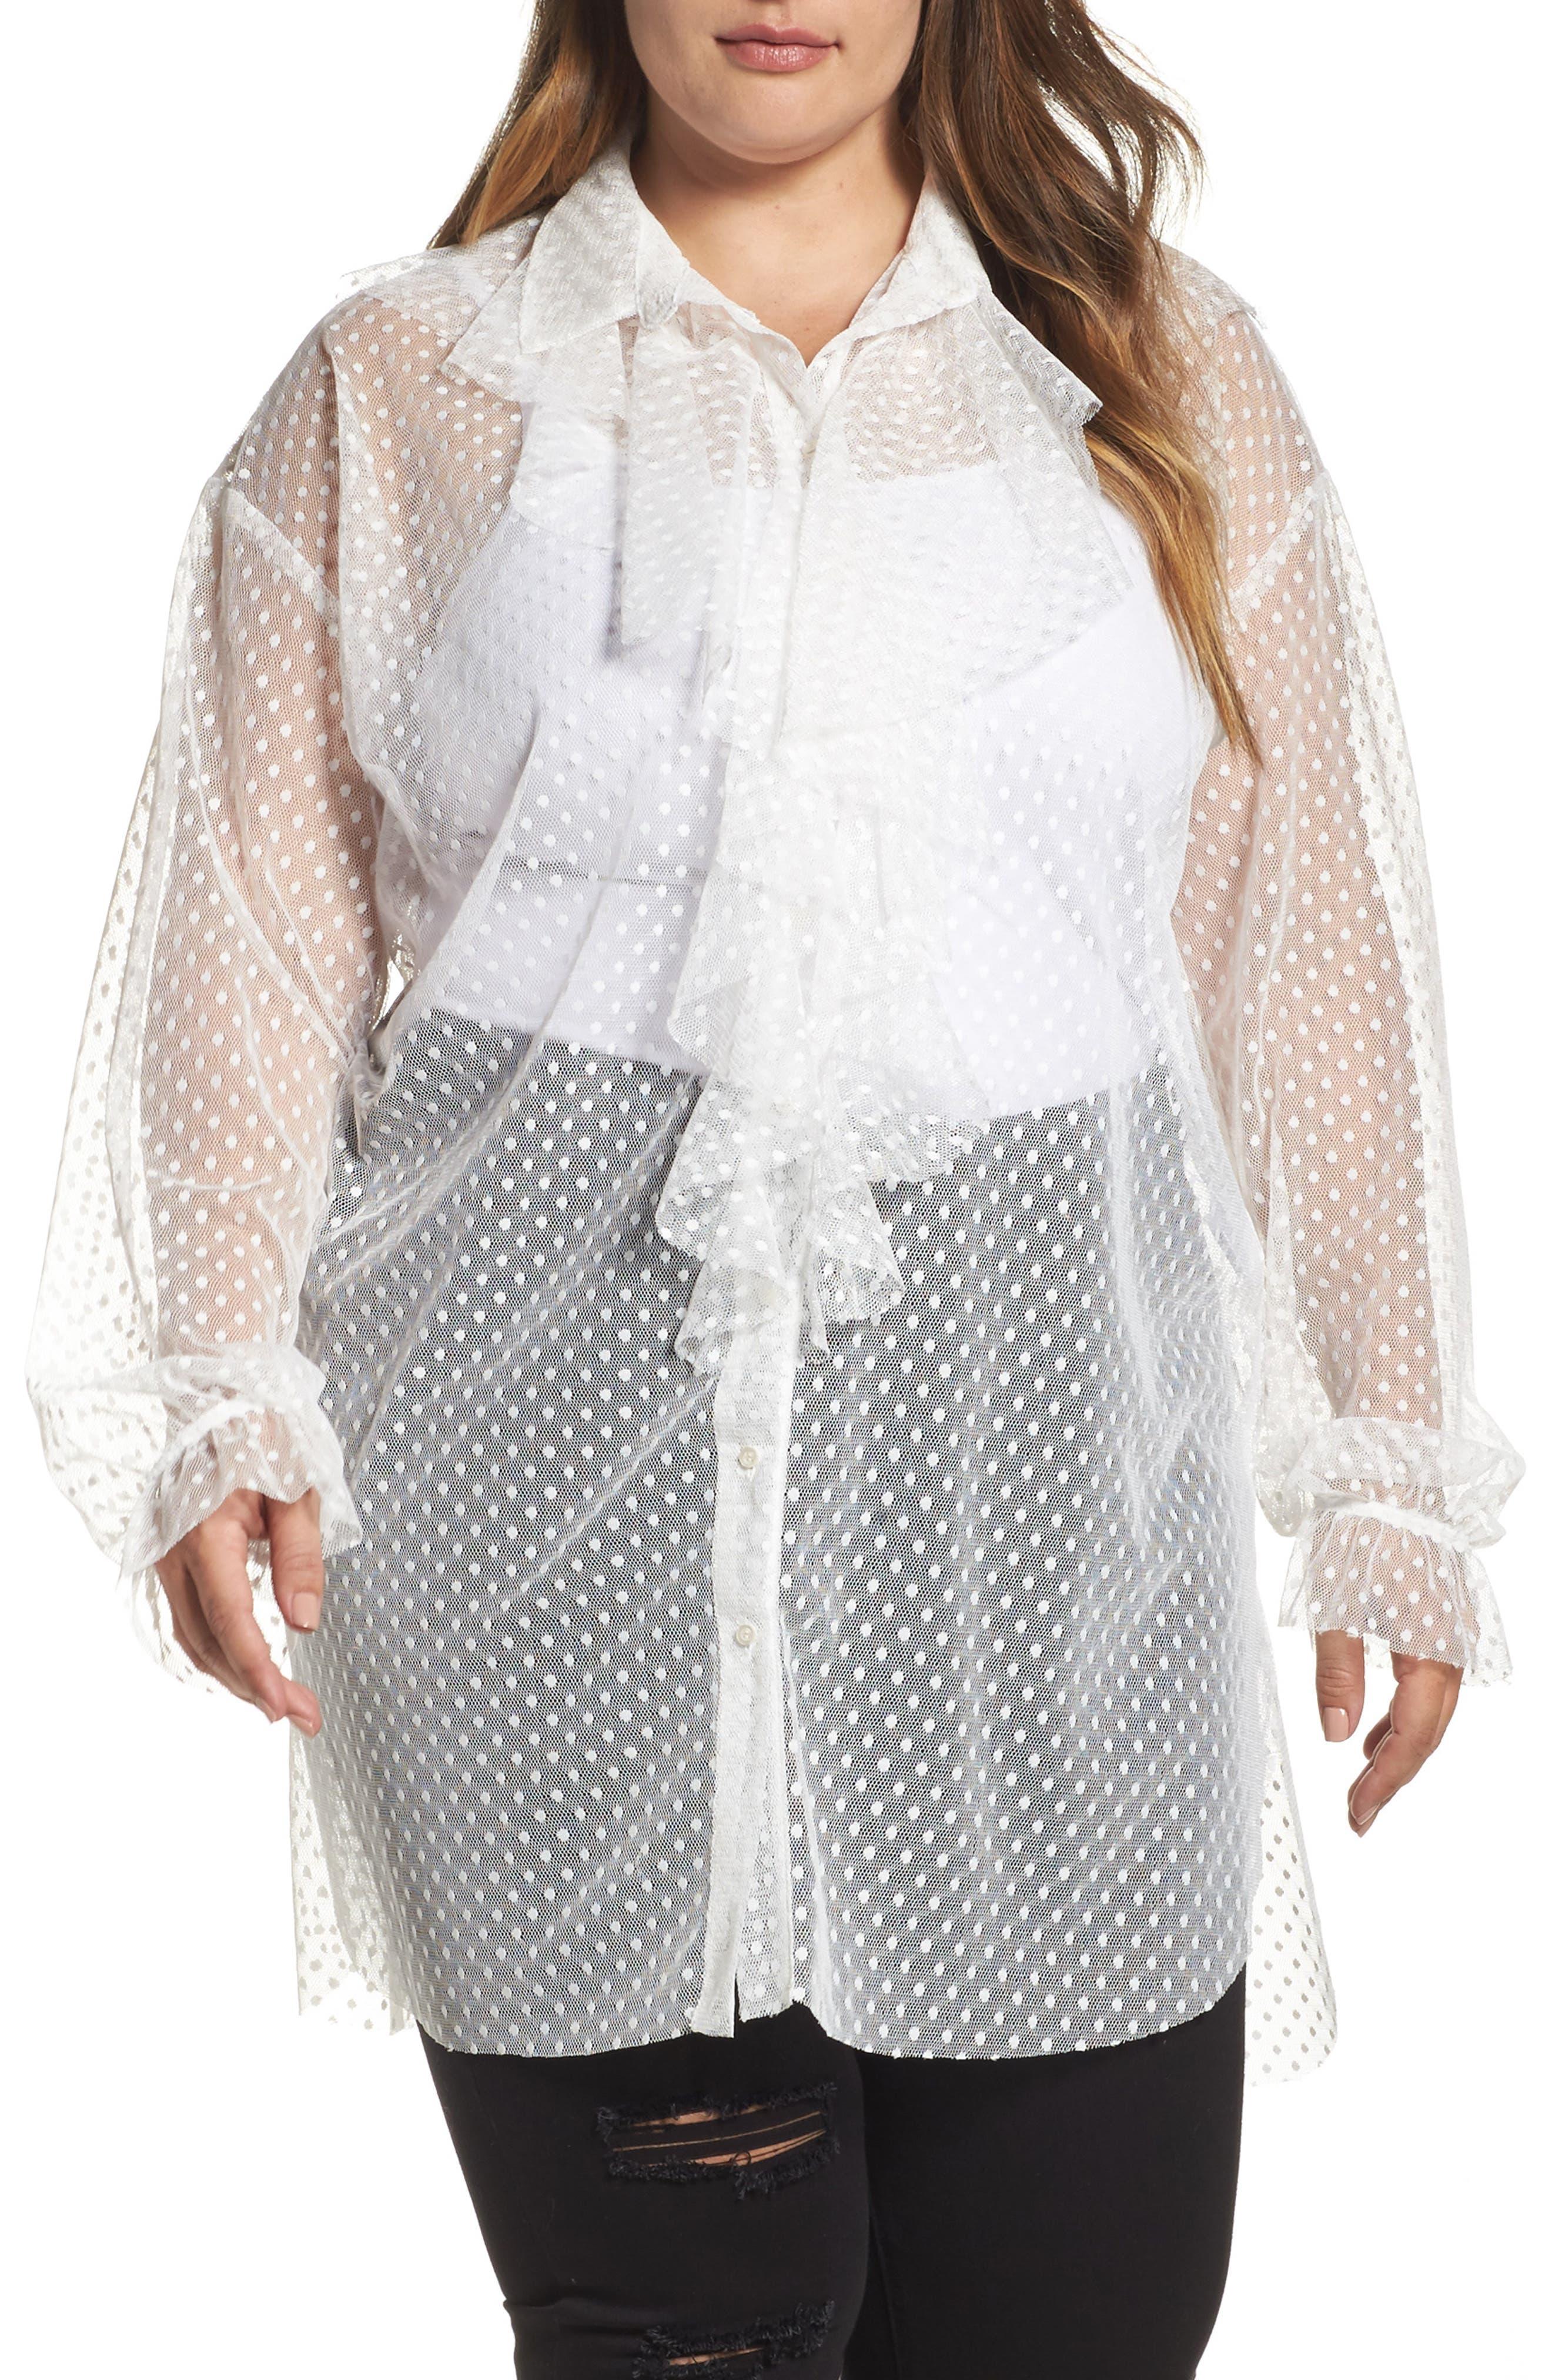 ELVI Polka Dot Mesh Ruffle Tunic Shirt (Plus Size)